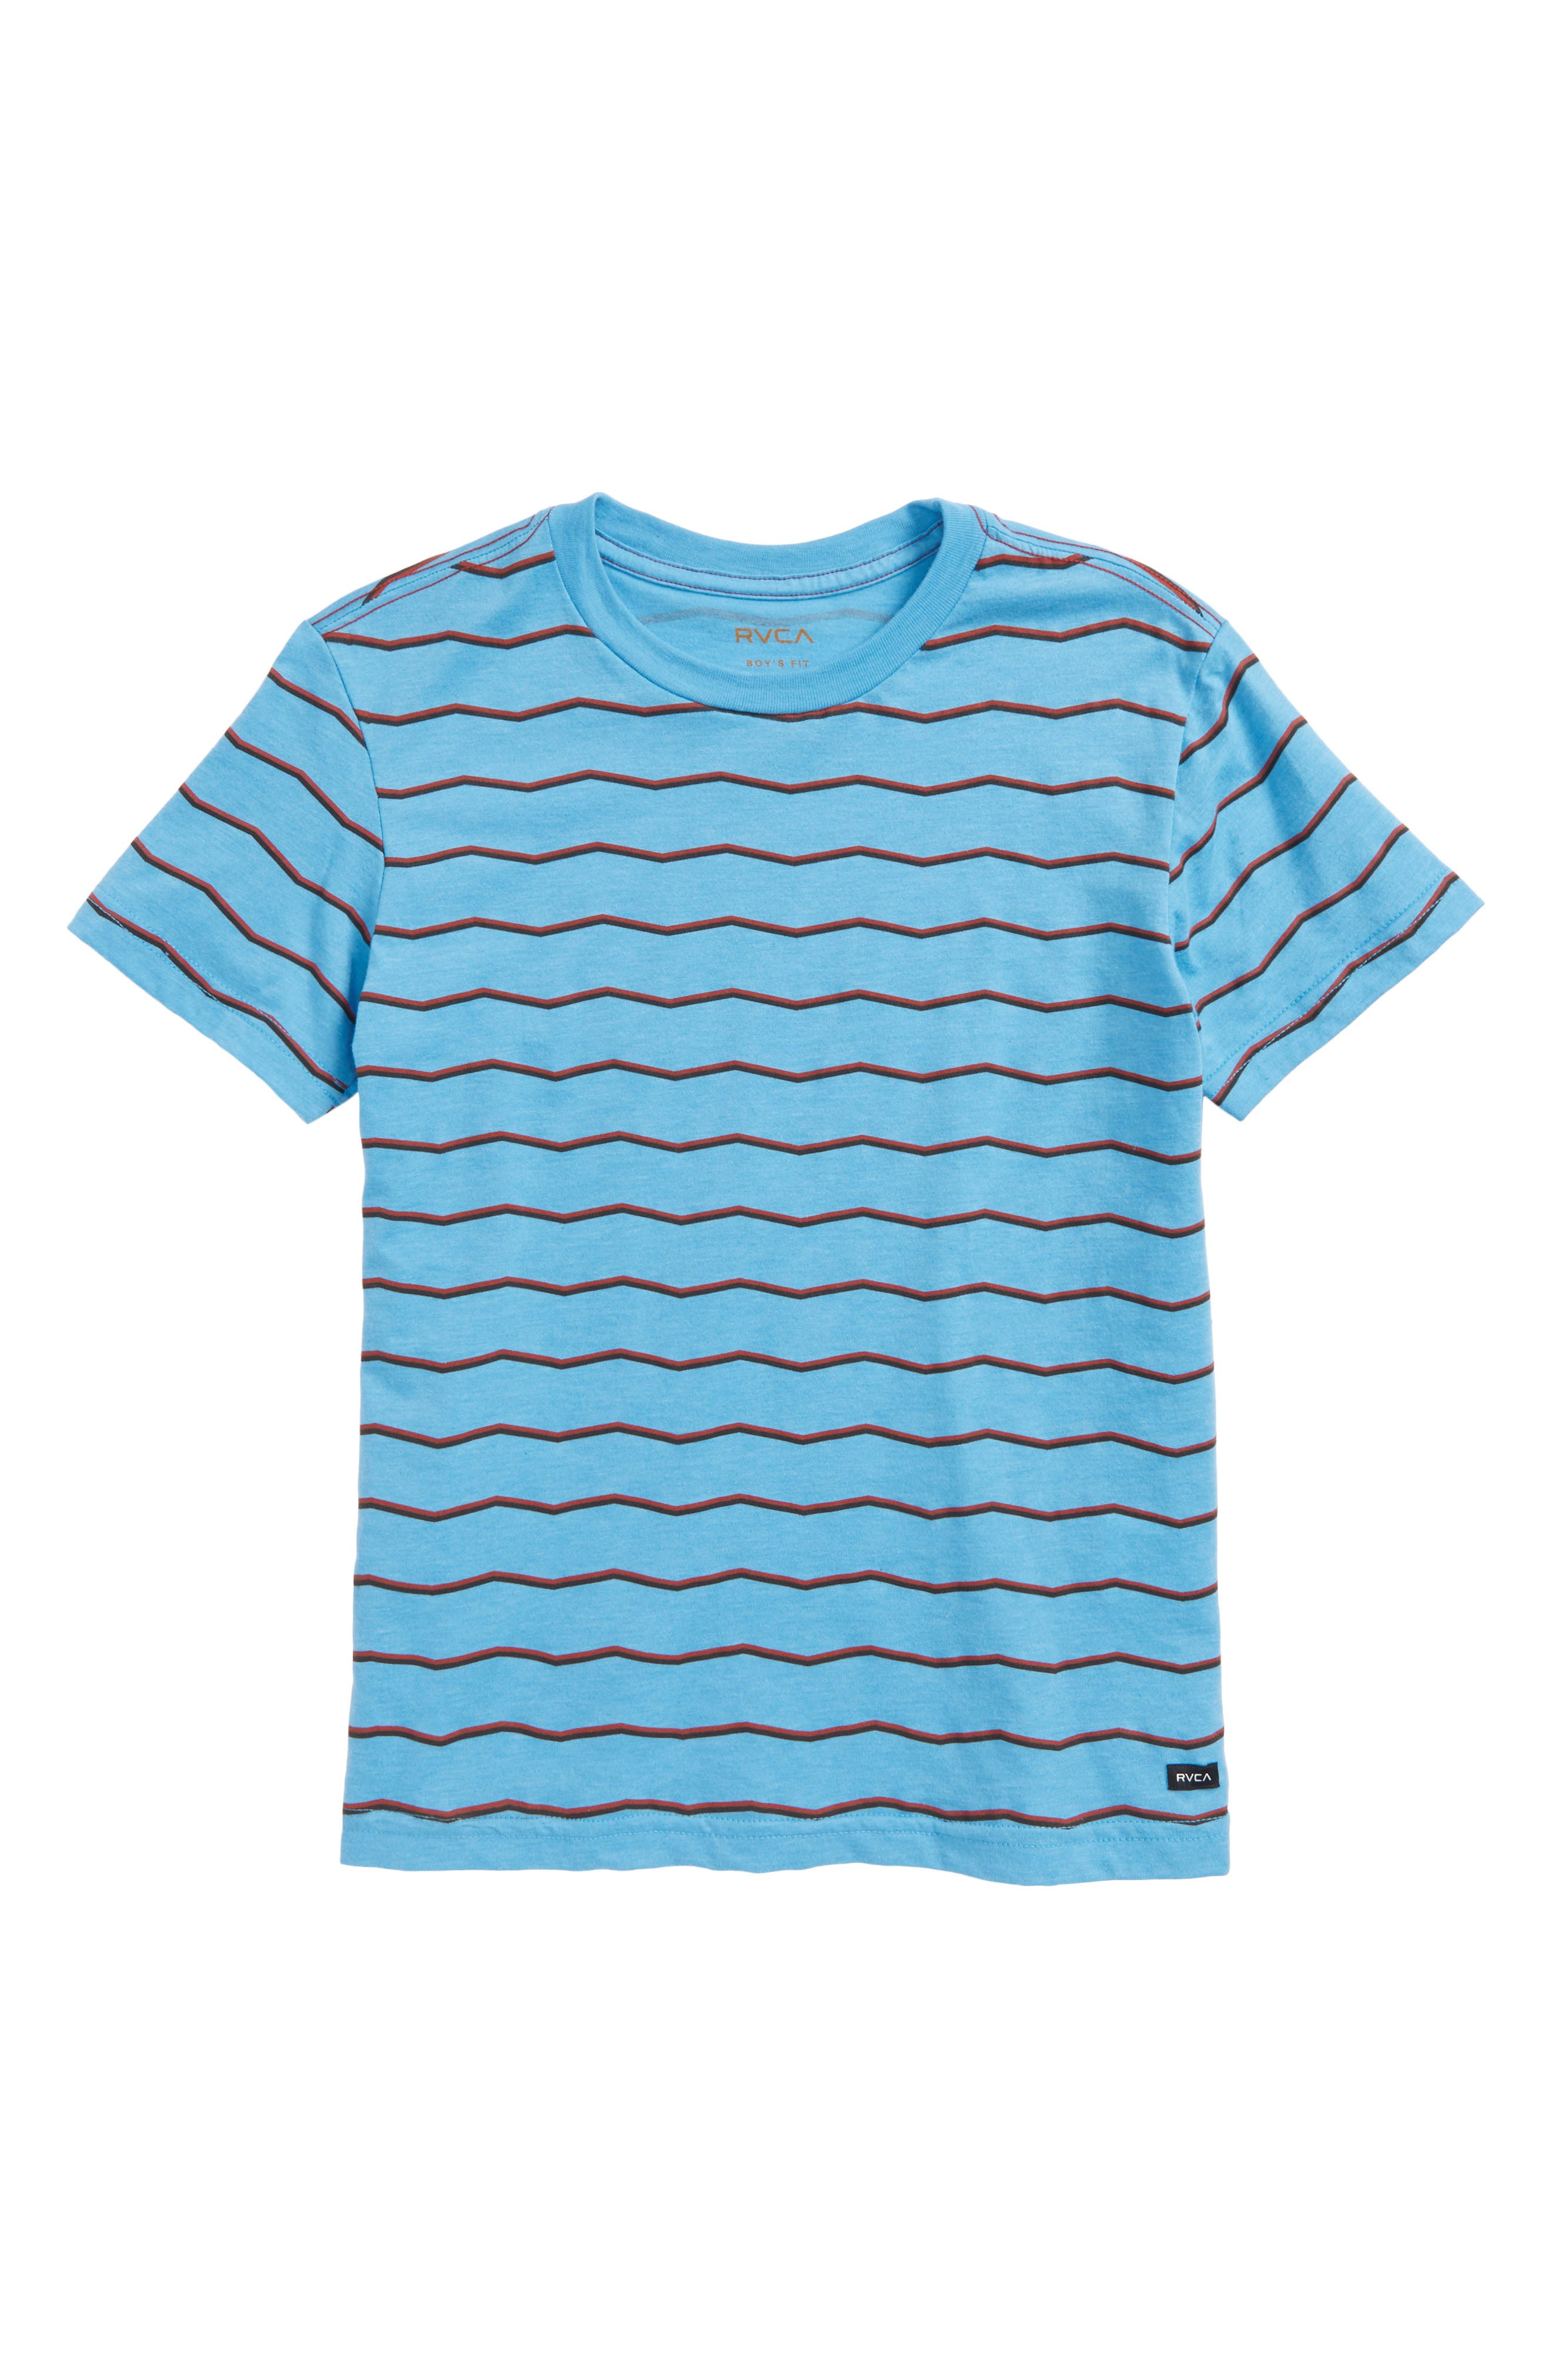 Stripe Shirt,                             Main thumbnail 1, color,                             460